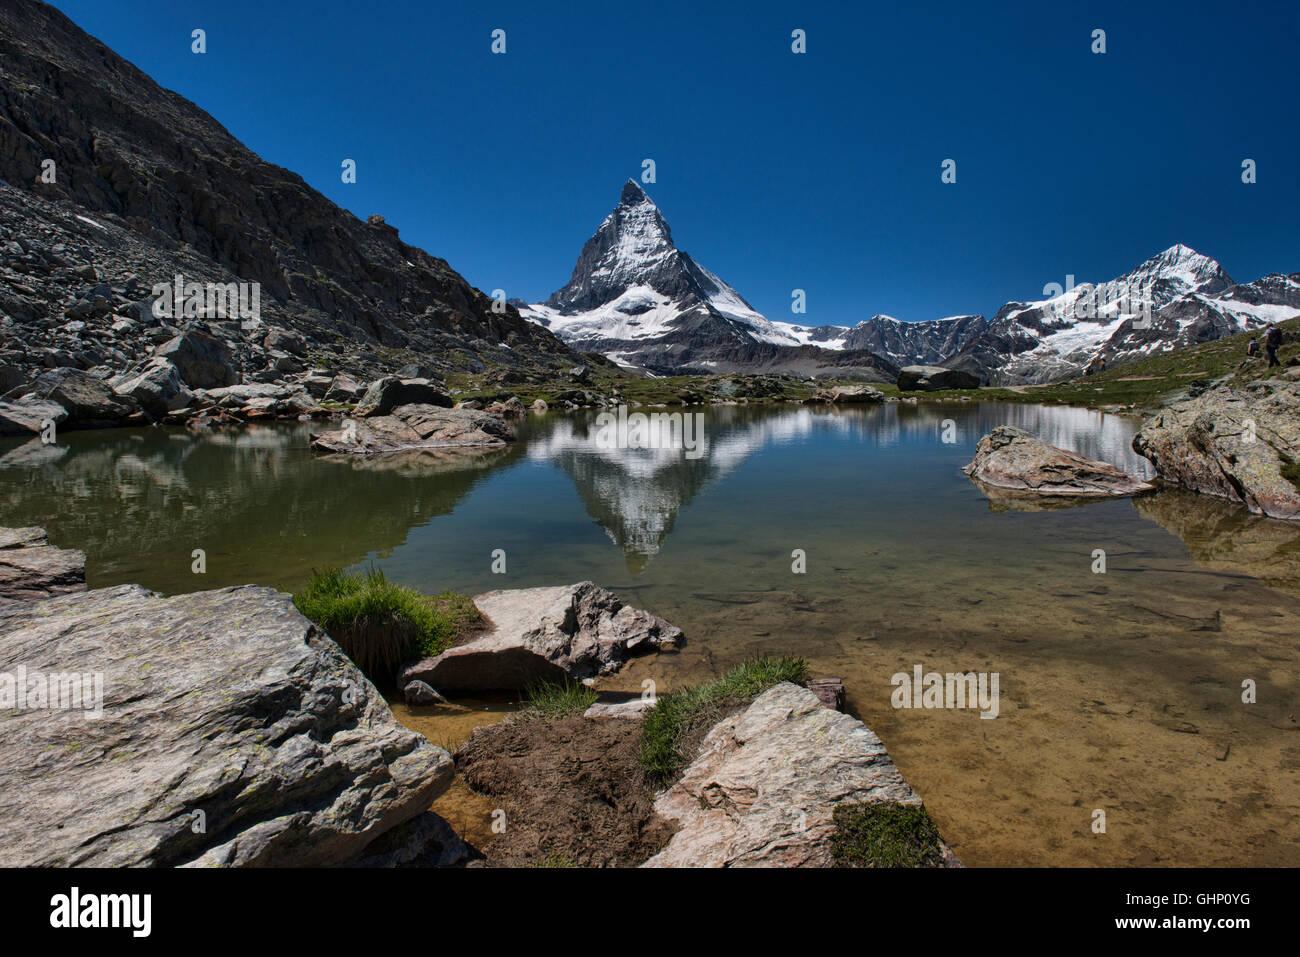 The Matterhorn reflected in a tarn below the Riffelsee, Zermatt, Switzerland - Stock Image